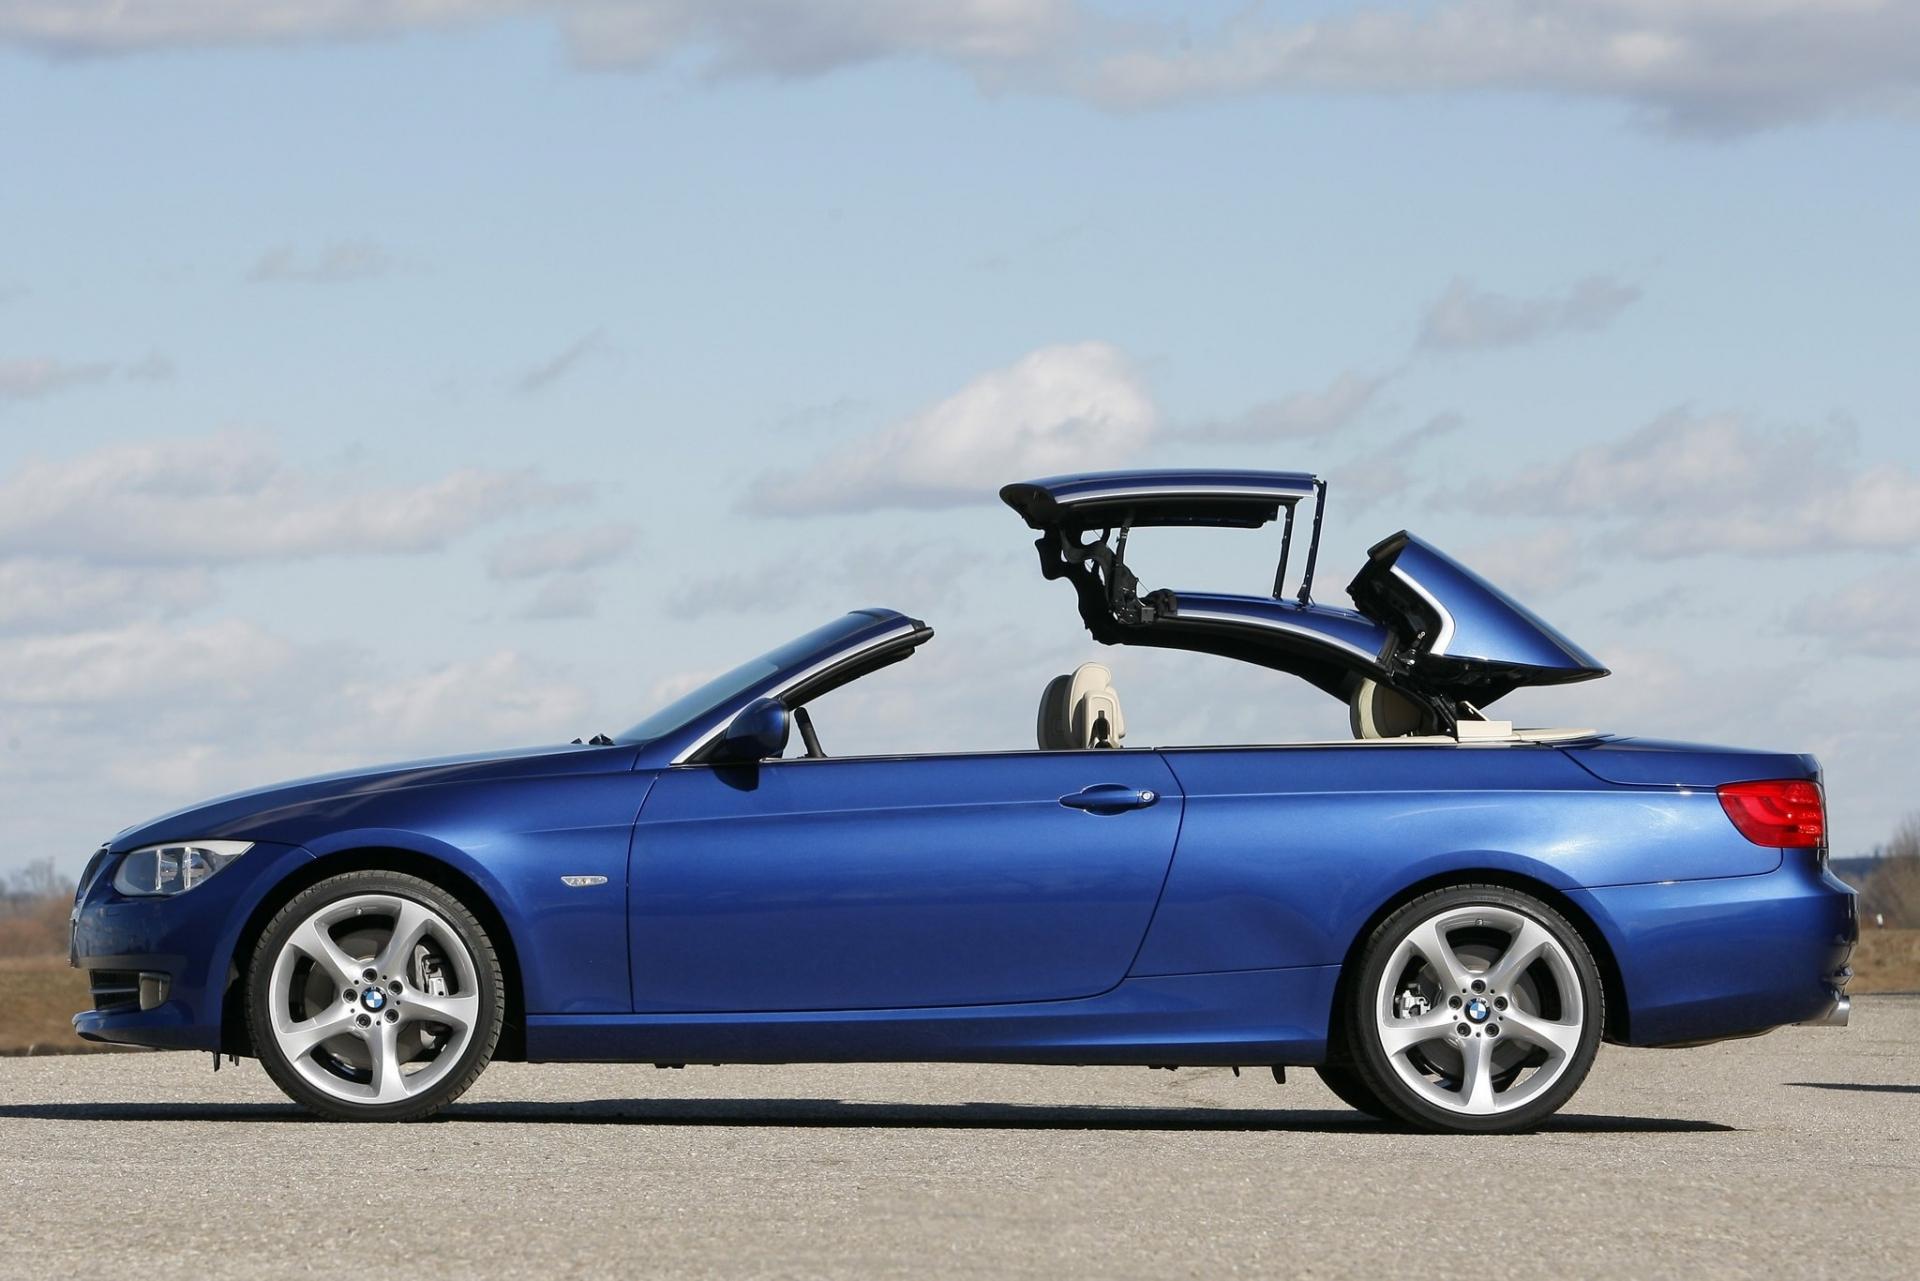 Bmw 3 Series Cabrio E93 цены отзывы характеристики 3 Series